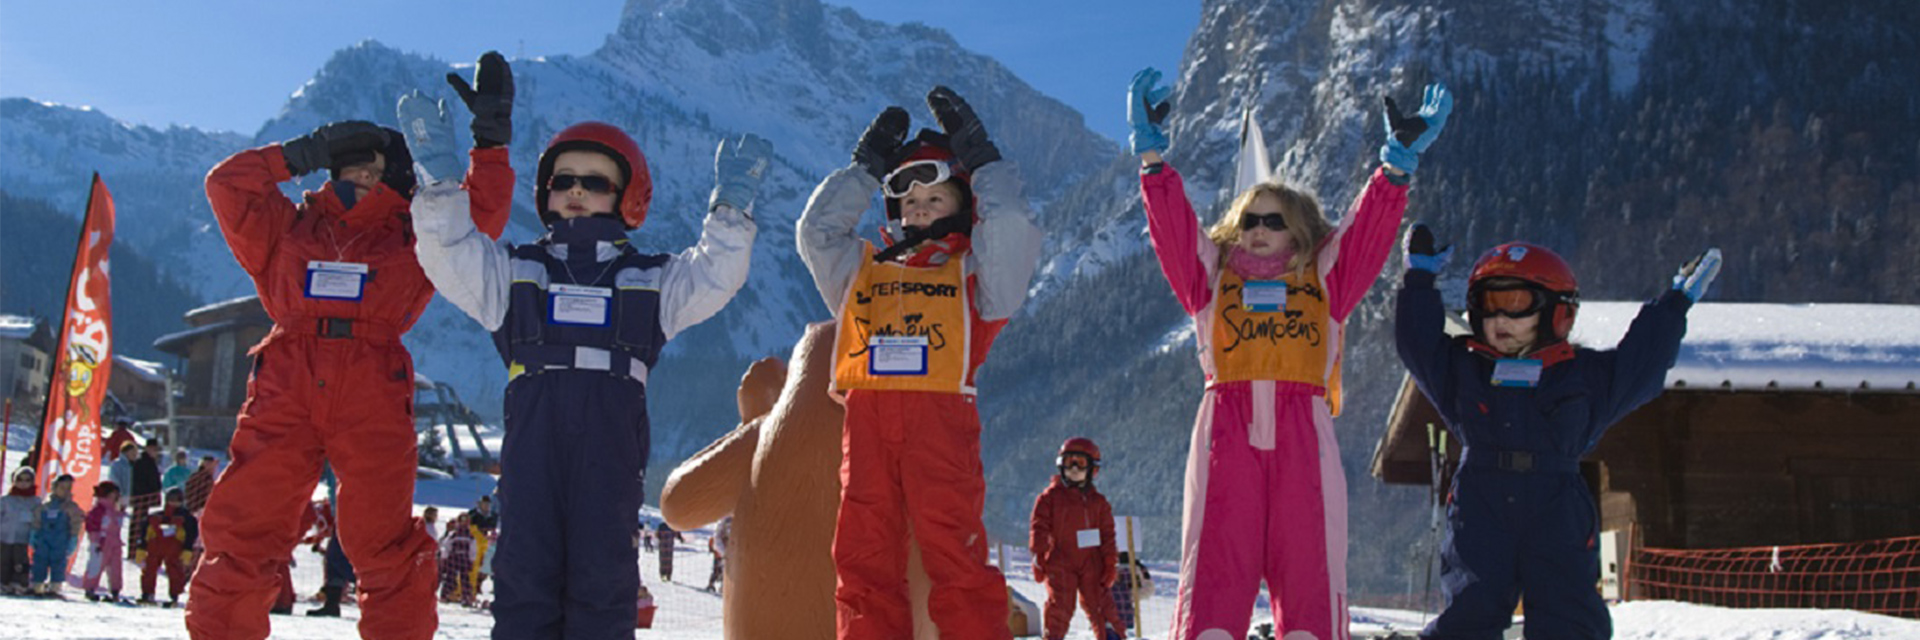 séjour-scolaire-ski-Le-Salvagny